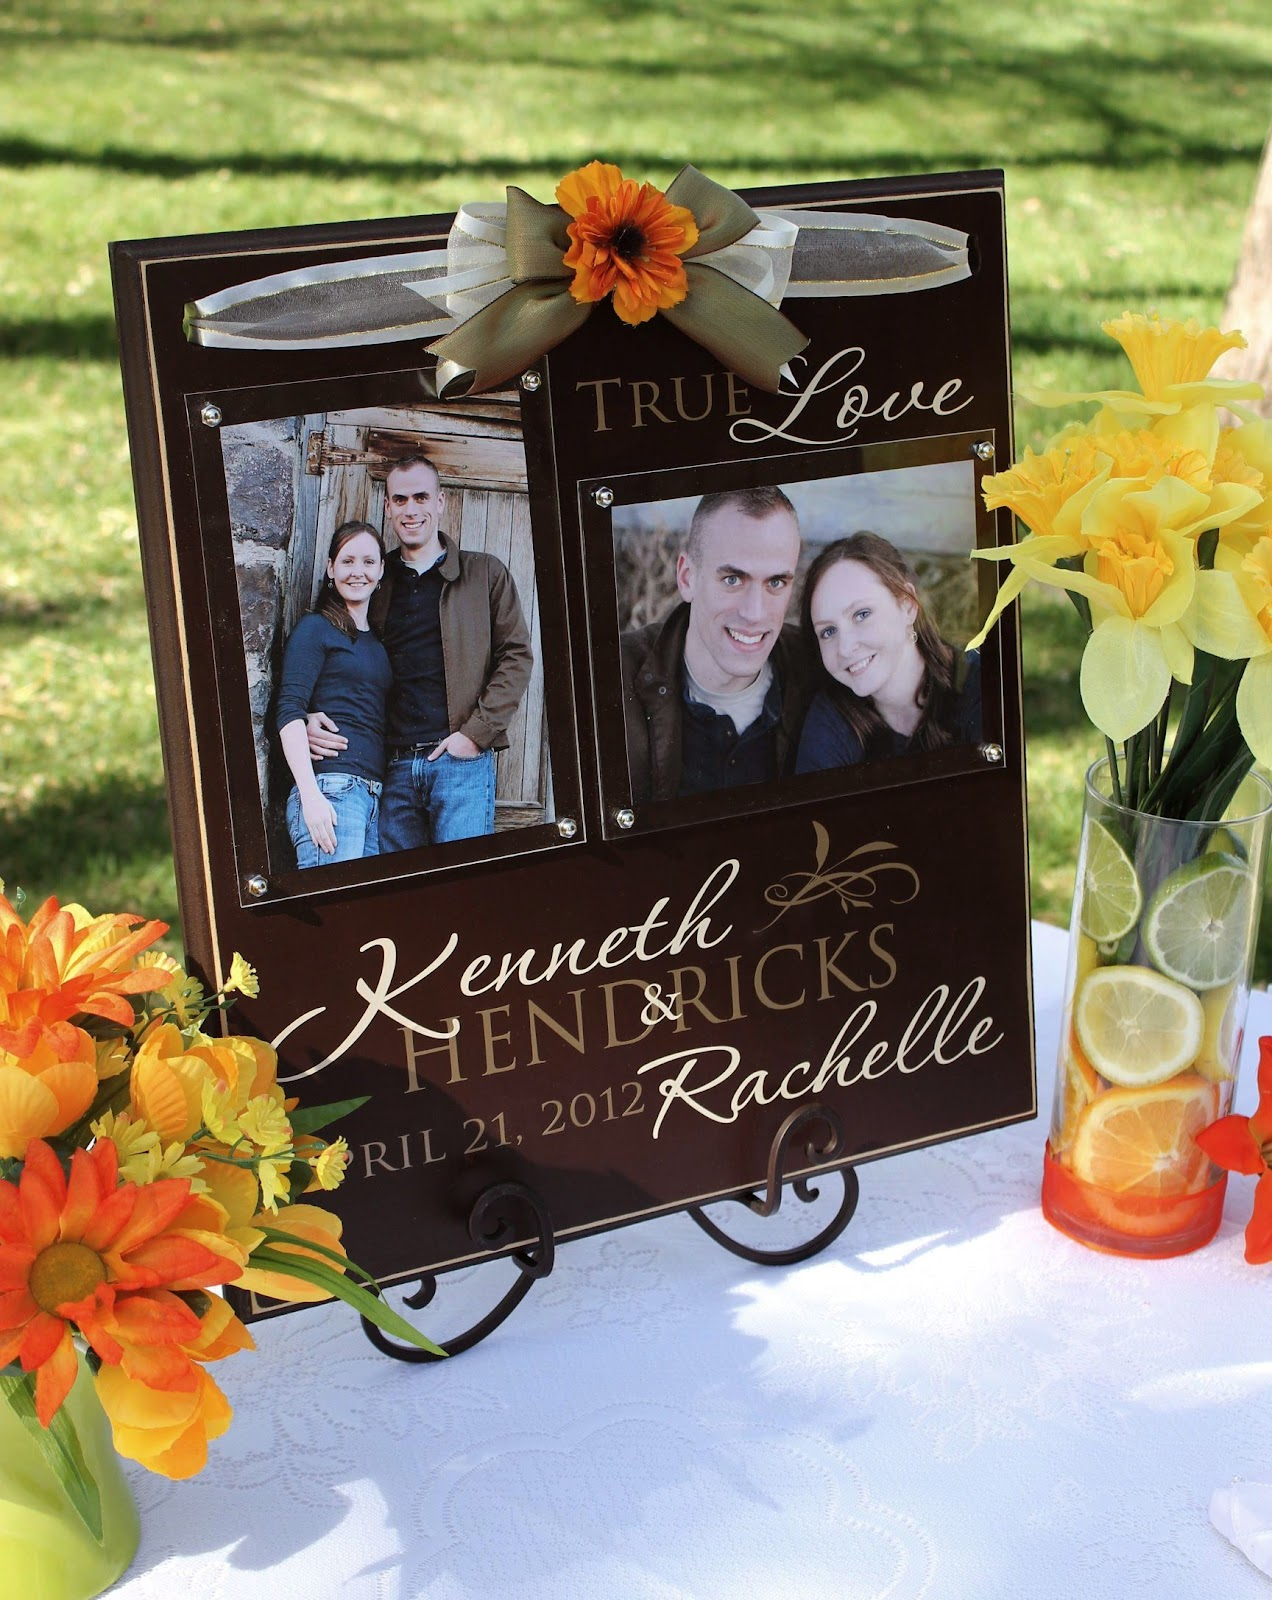 http://4.bp.blogspot.com/-i4ZrdXbC_fg/T54TakeQi9I/AAAAAAAAEbo/ic4nXS8FUXQ/s1600/Rachelle\'s+Plaque+4.jpg